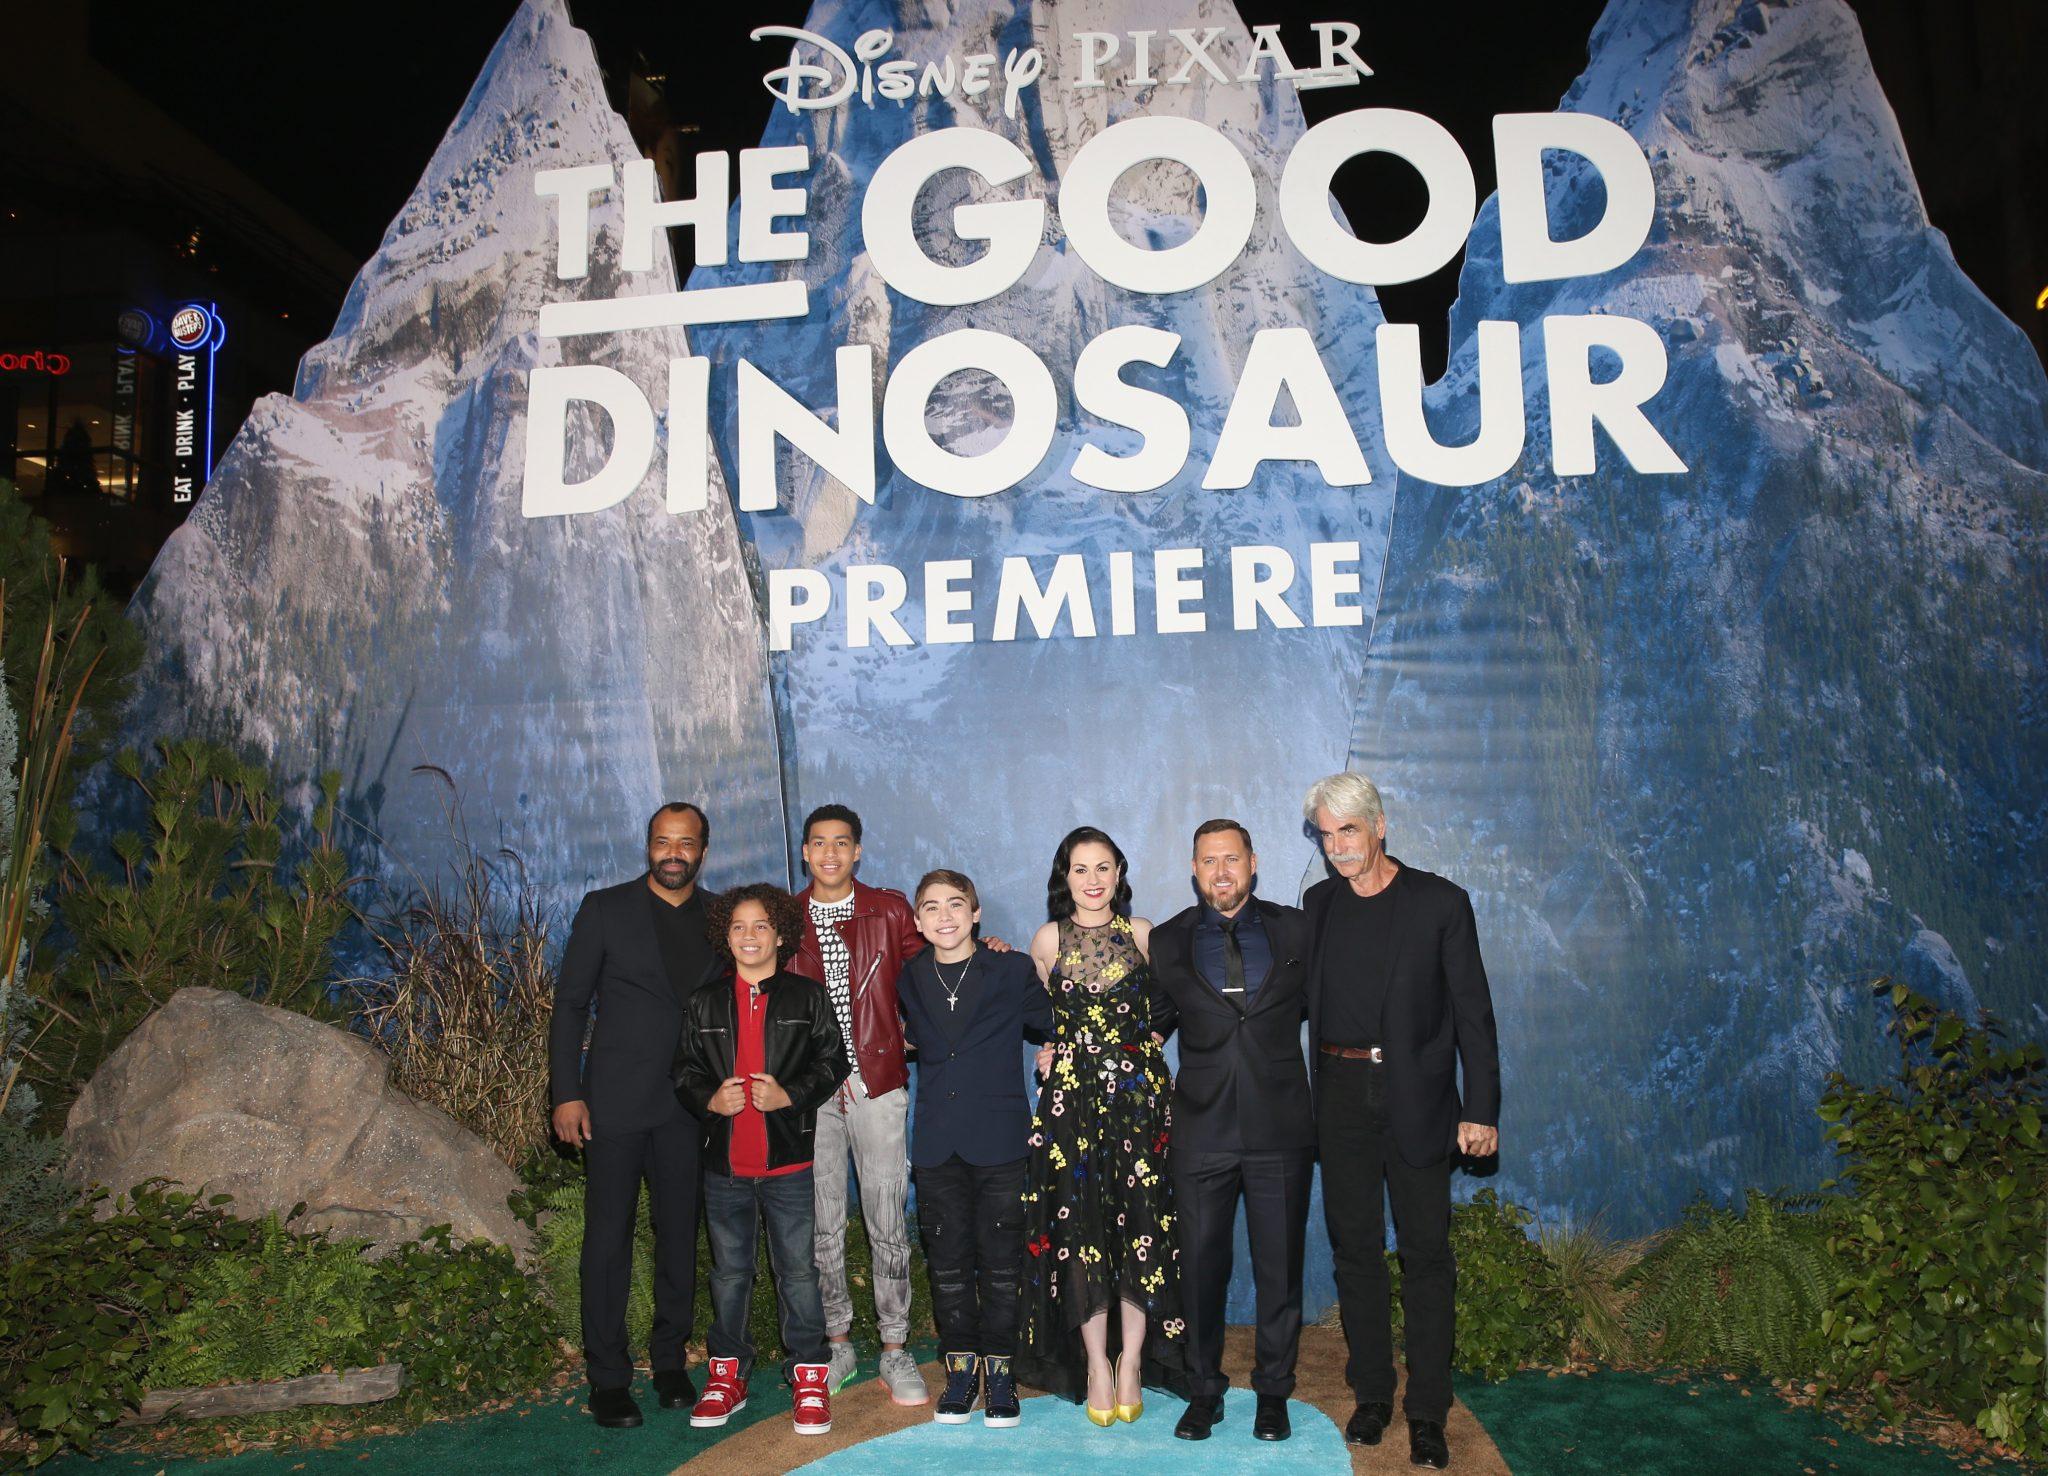 Red Carpet Arrivals: Disney Pixar The Good Dinosaur Premiere